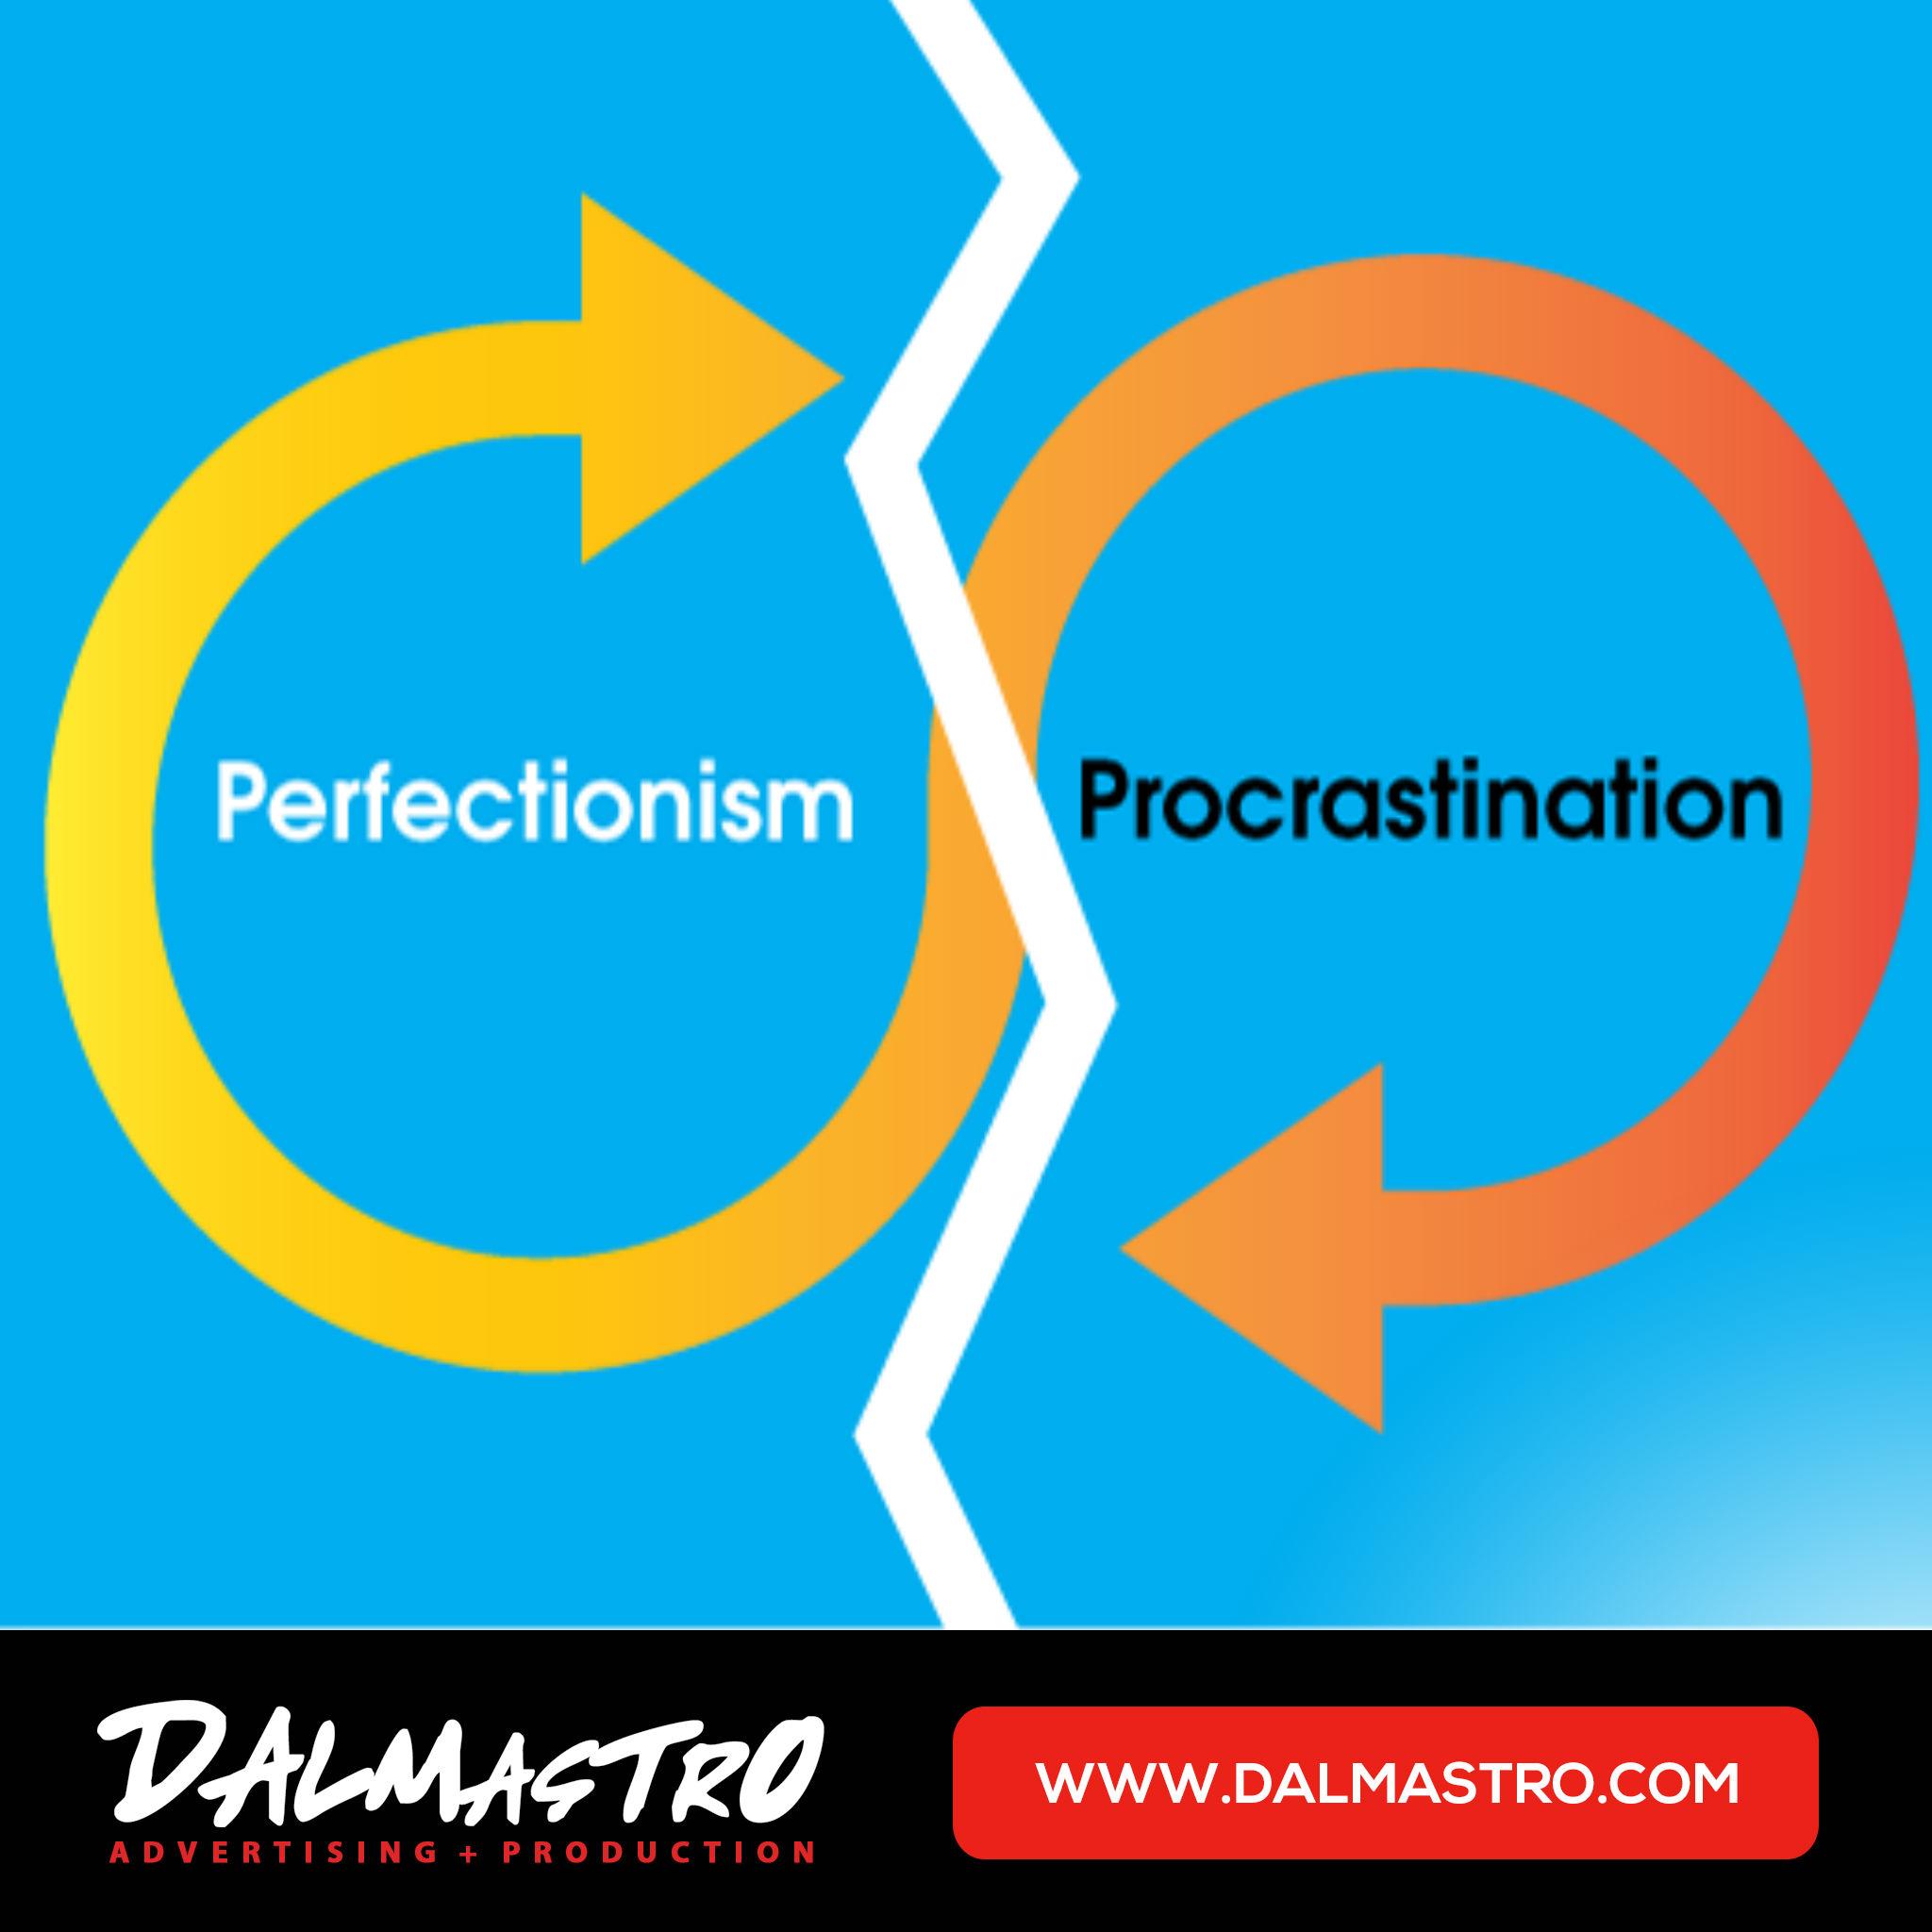 Procrastination and Perfectionism